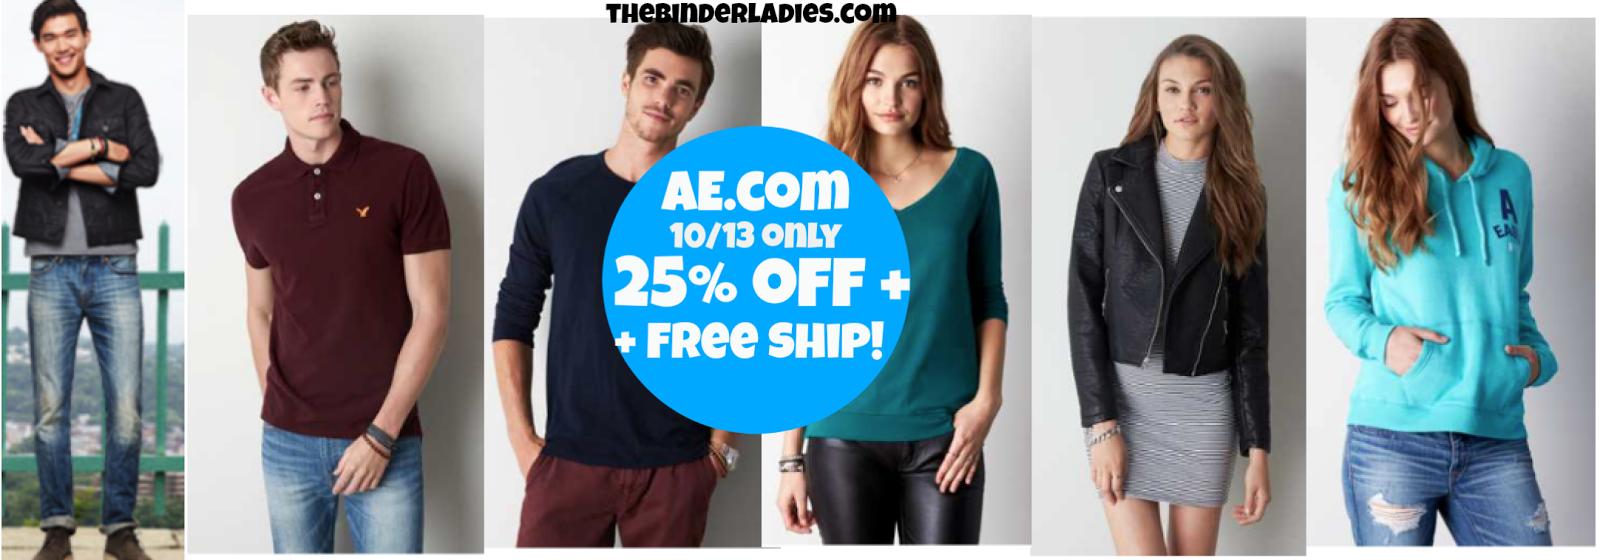 http://www.thebinderladies.com/2014/10/americaneaglecom-free-shipping-25-off.html#.VDv1ZEvdtbw